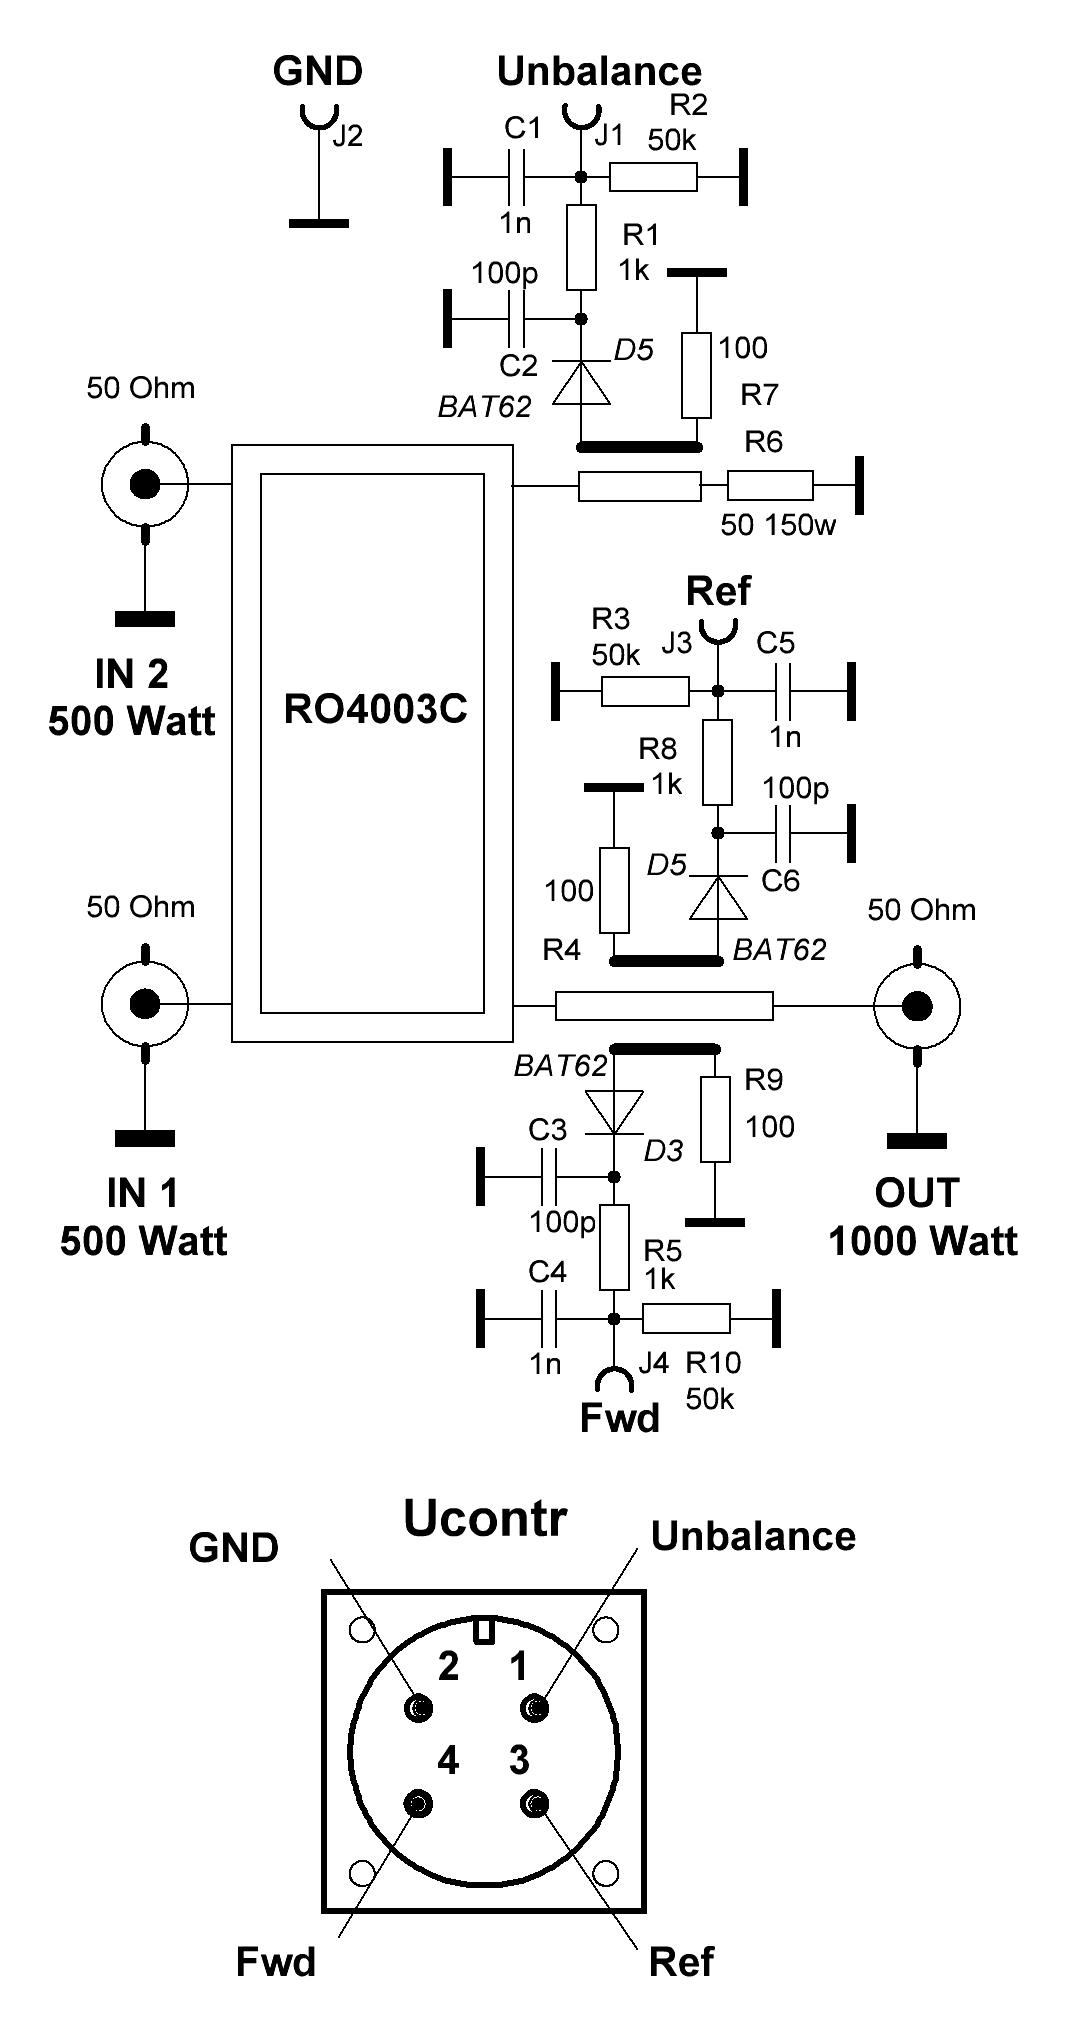 High Power 23cm combiner schematics from 2020-10-16